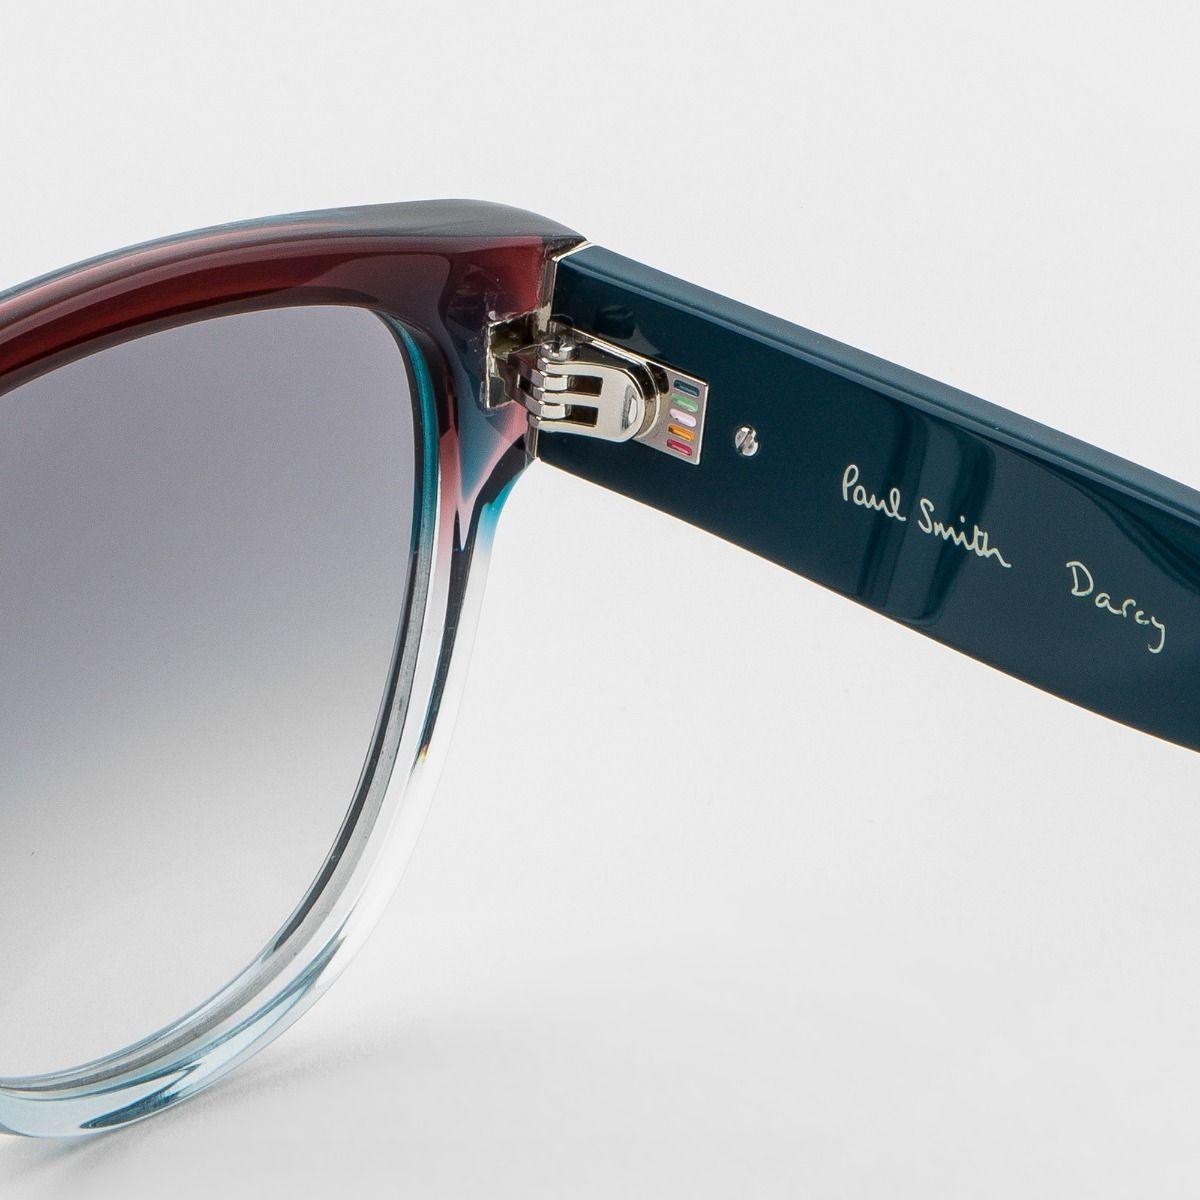 Paul Smith Darcy Round Sunglasses